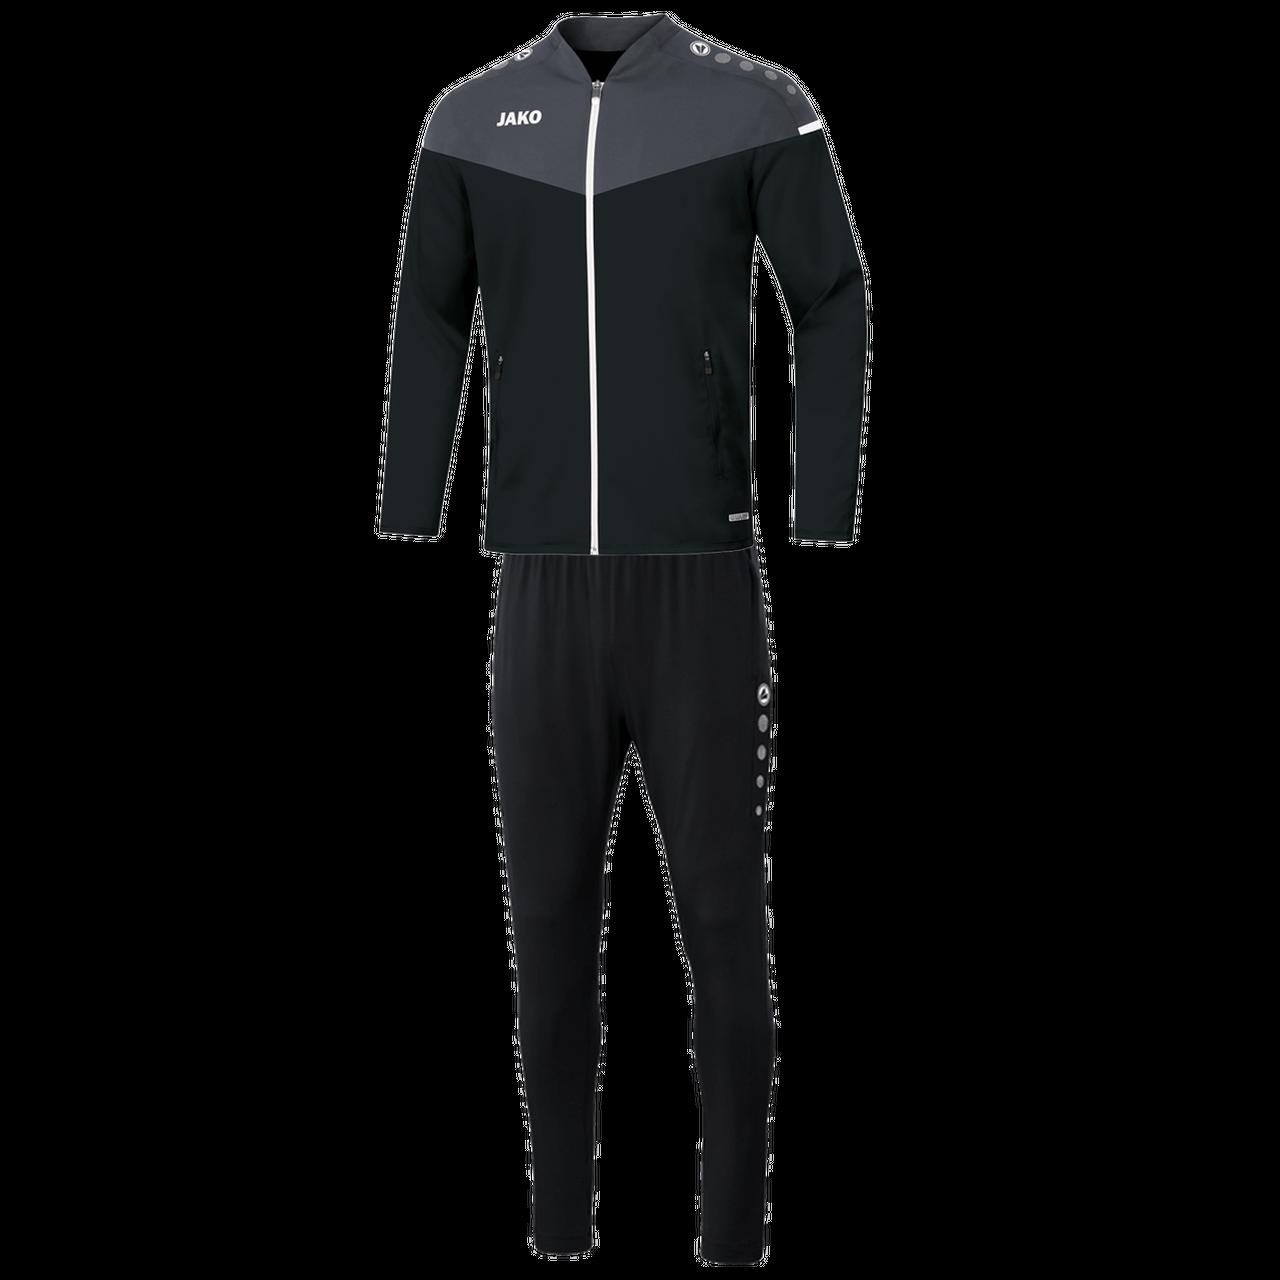 [Set] Presentation jacket Champ 2.0 + tracksuit trousers Premium